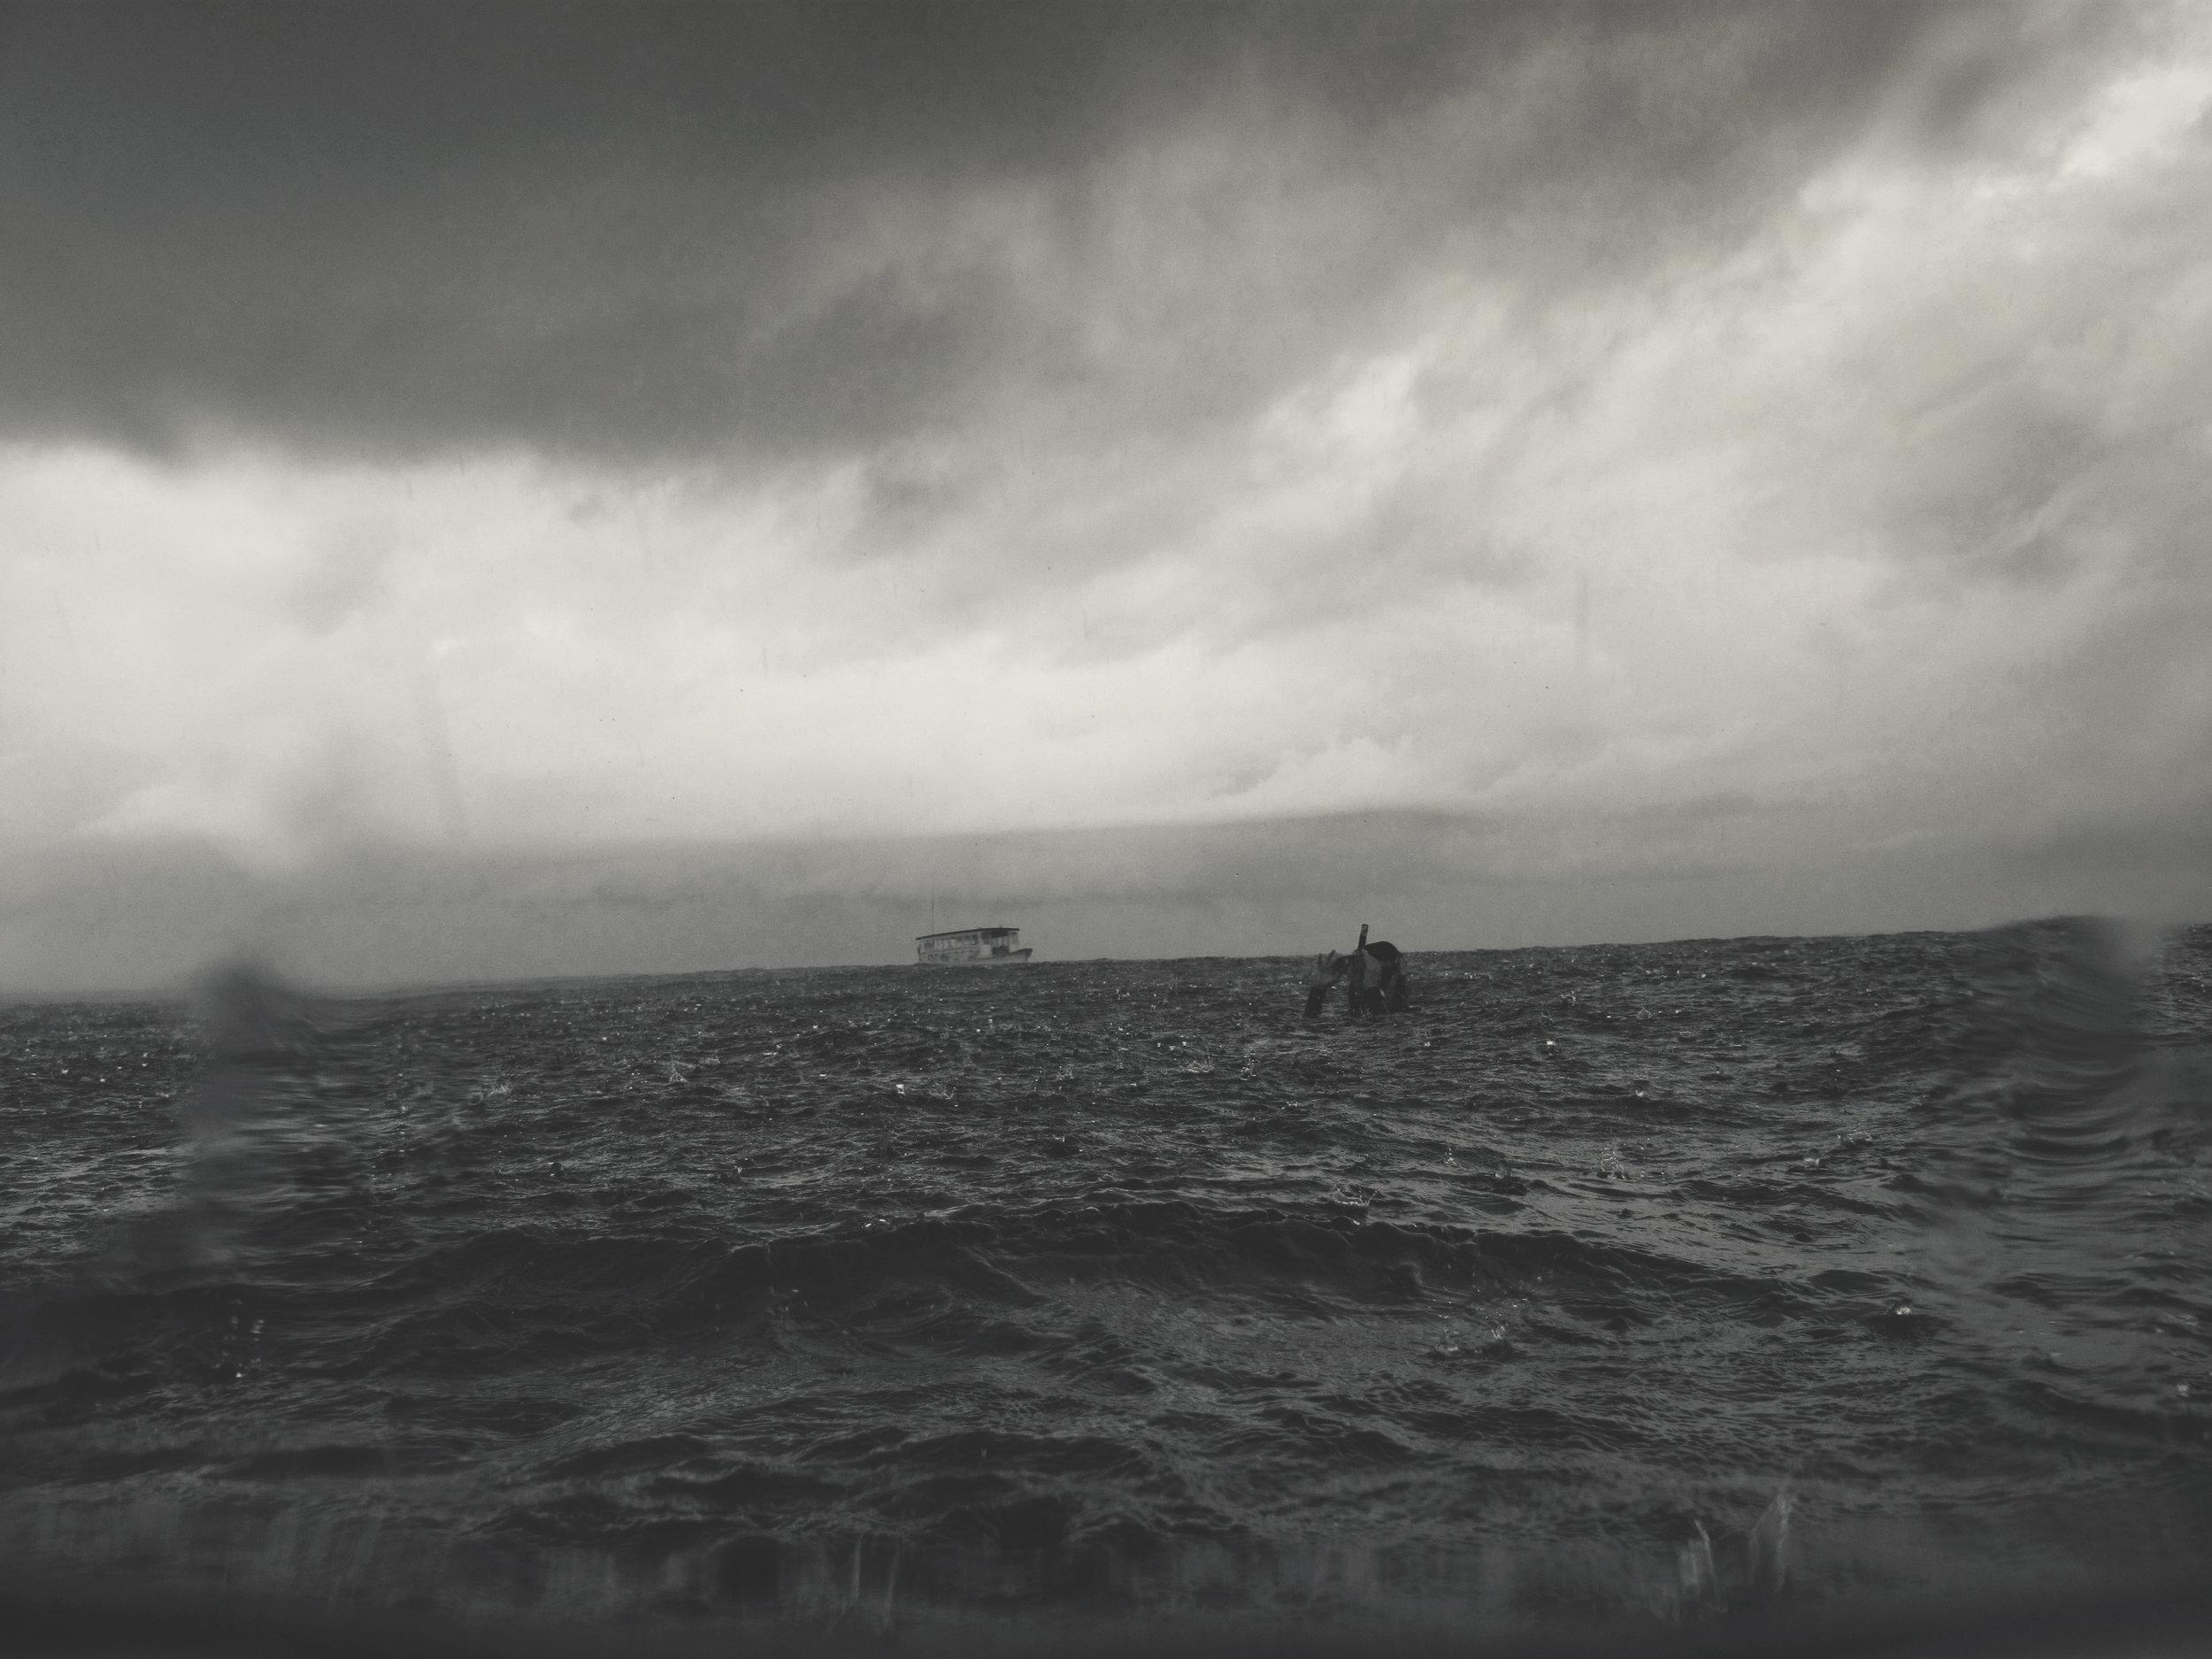 2009-06-11 - Maldives - Baa Atoll - rain storm on the reef - IMG_3402.jpg